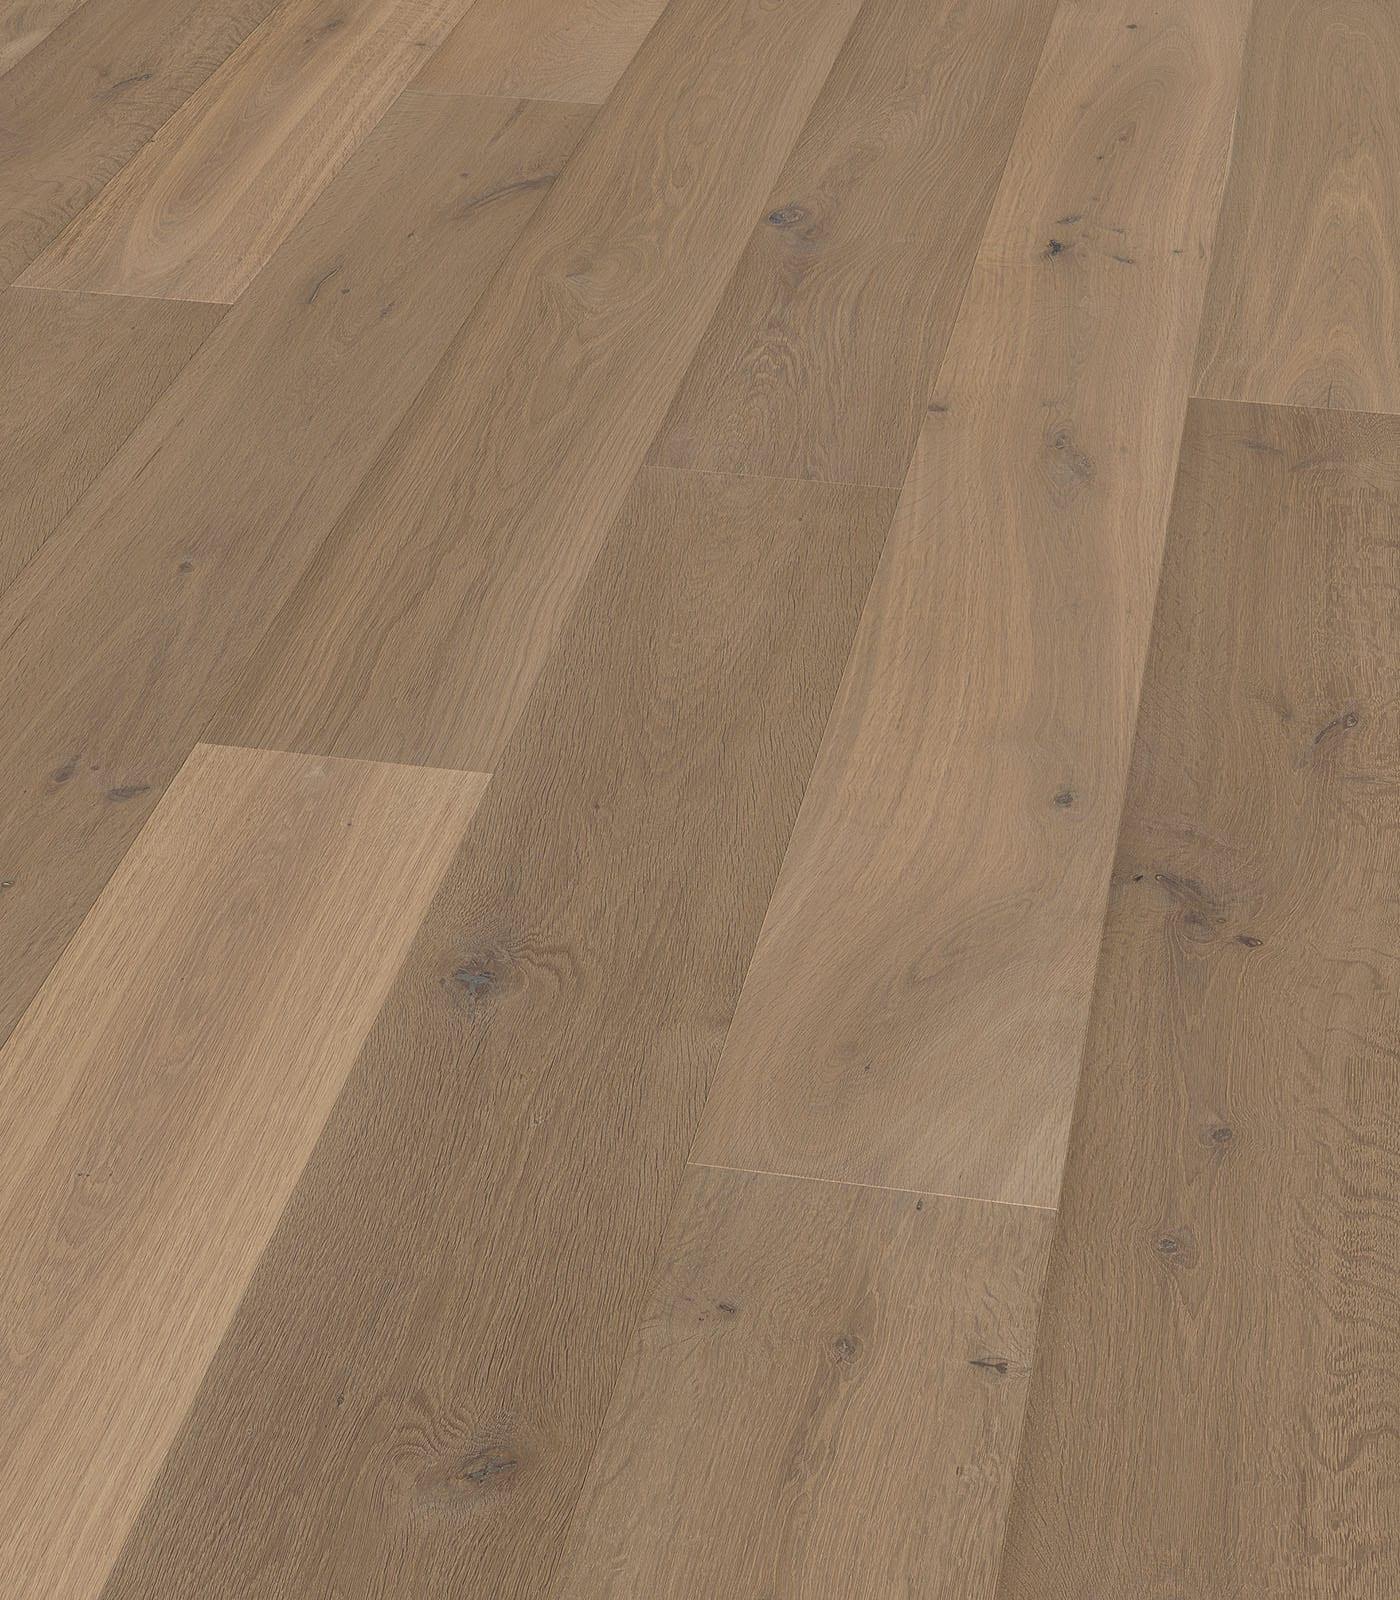 Majorca-Lifestyle Collection-European Oak Floors-angle